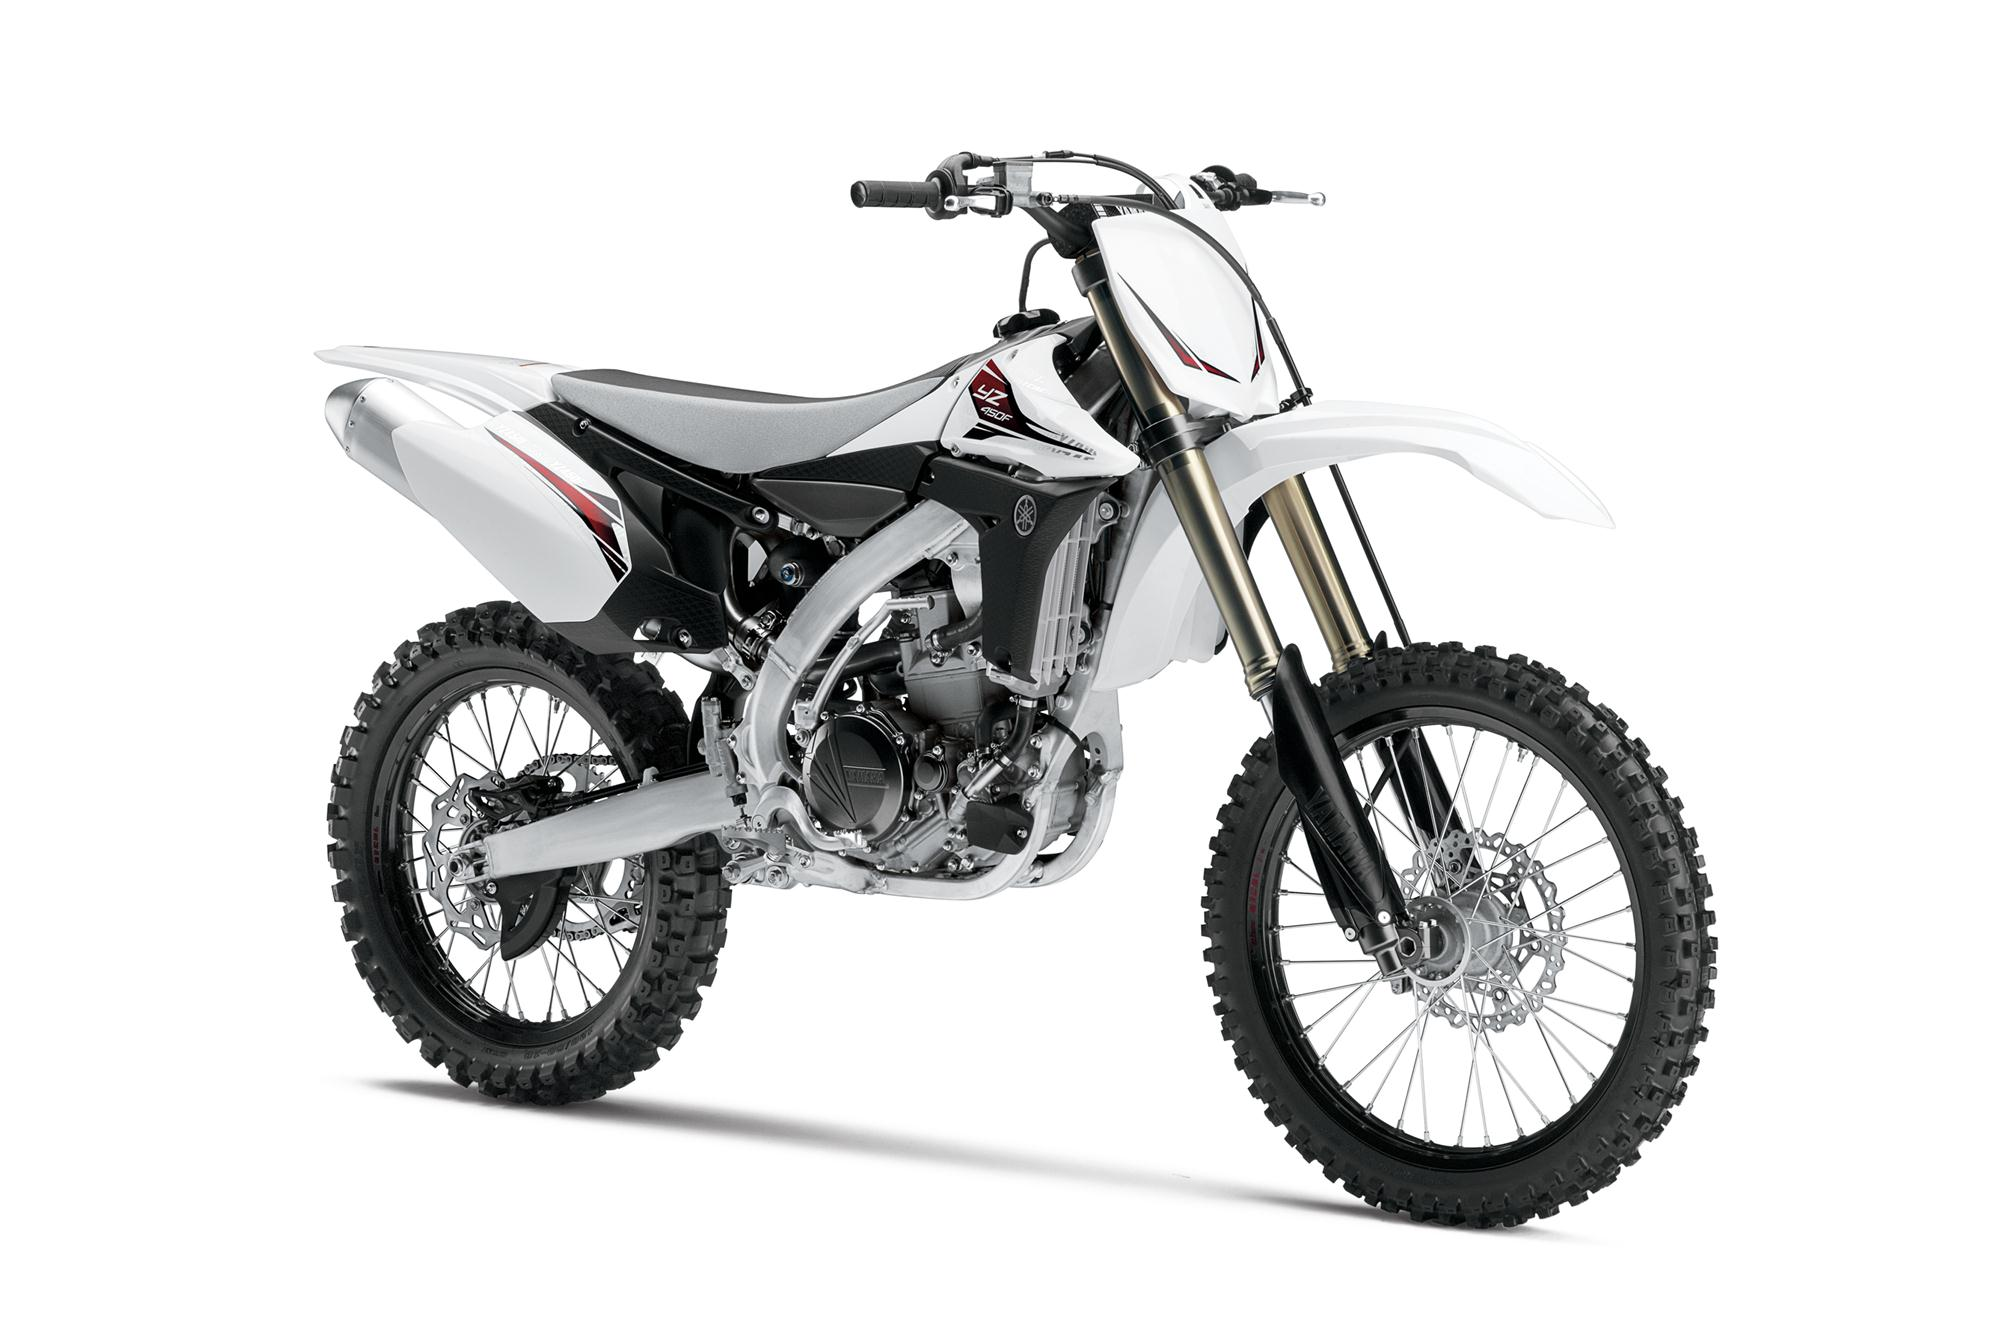 2013 yamaha yz450f  a fun and powerful dirt beast